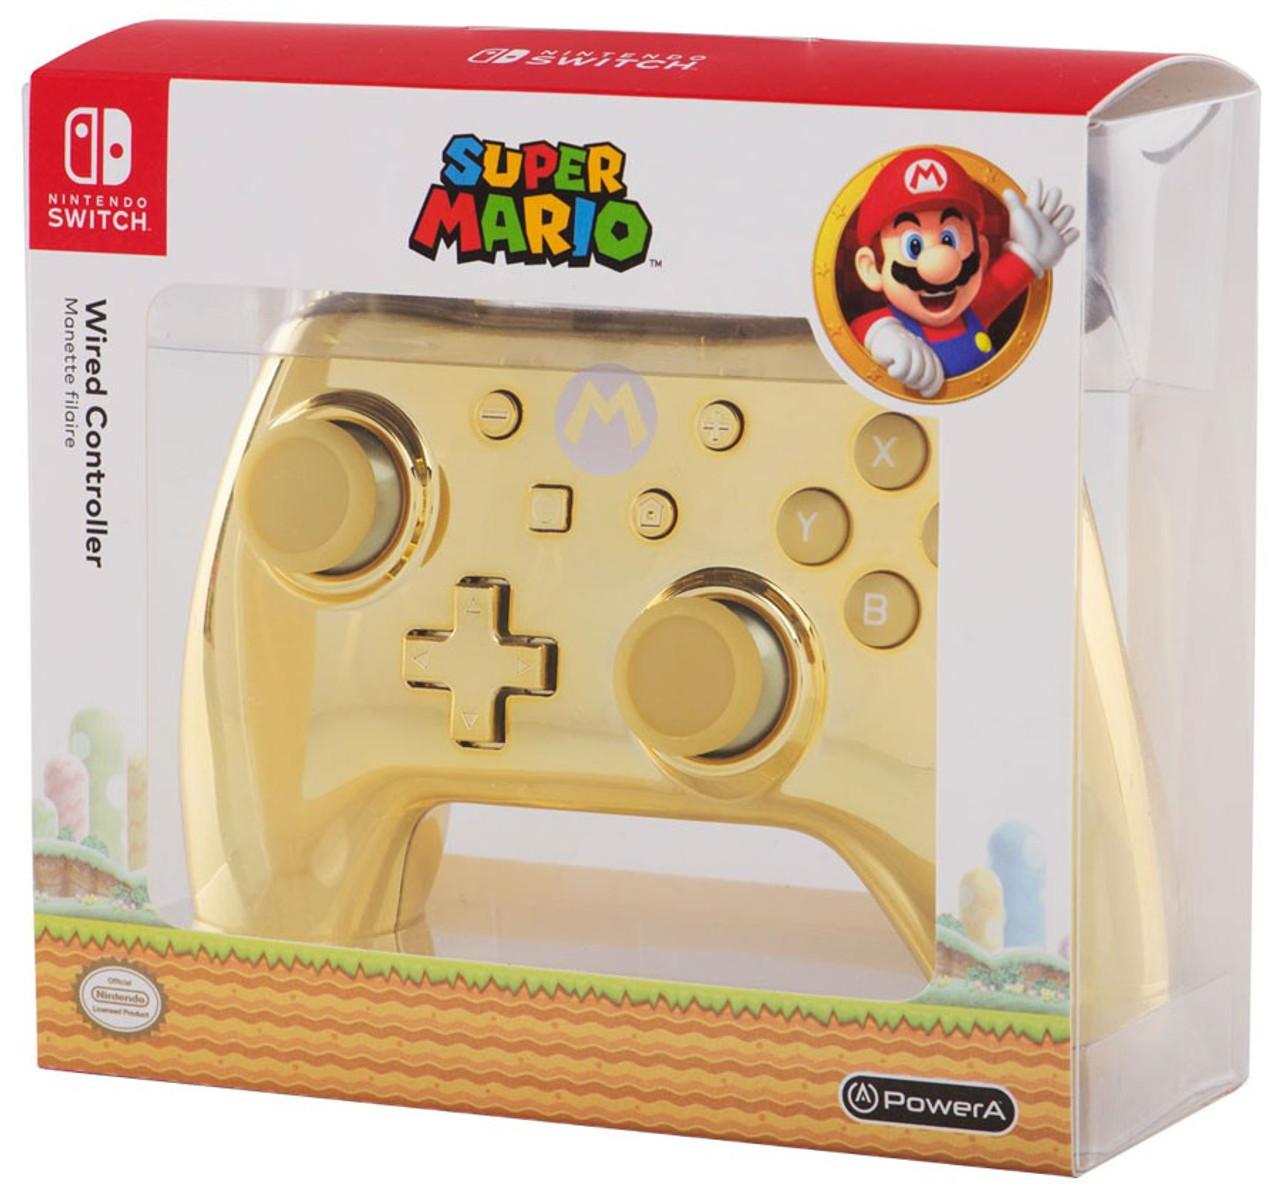 Nintendo Switch Super Mario Gold Chrome Mario Video Game